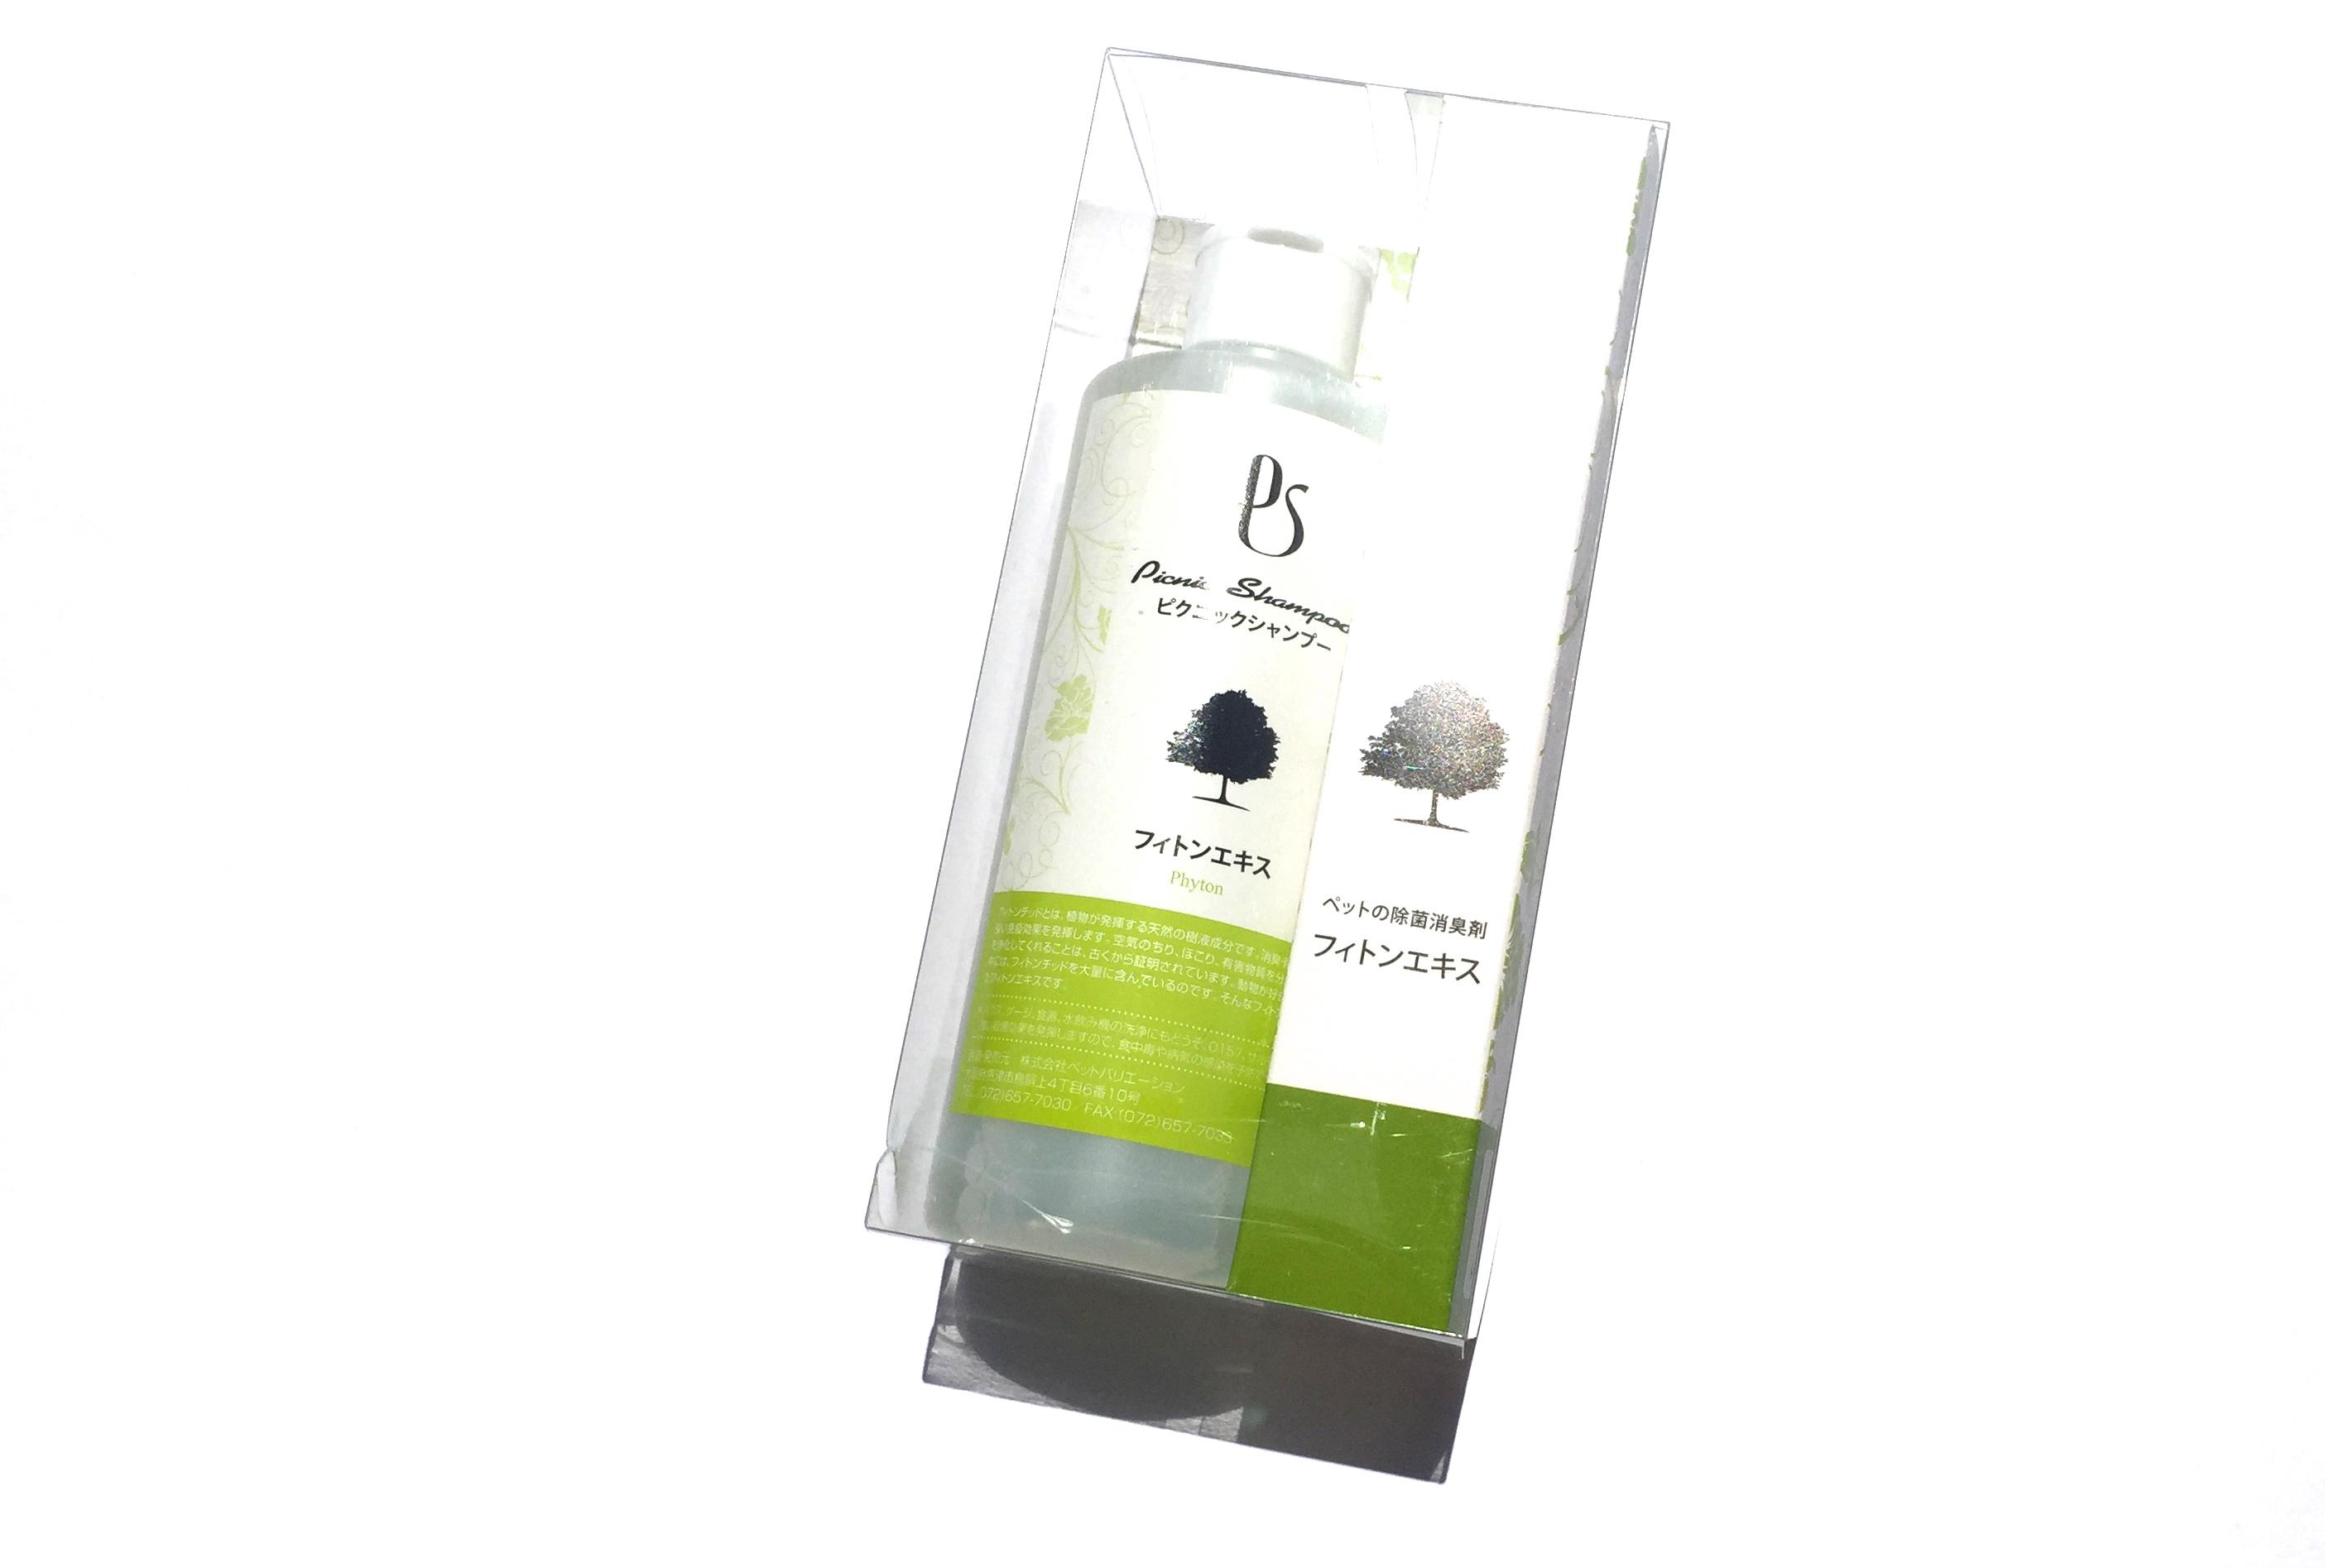 Picnic Shampoo  PHyton Extract ピクニック シャンプーフィトン エキス_d0217958_1136672.jpg